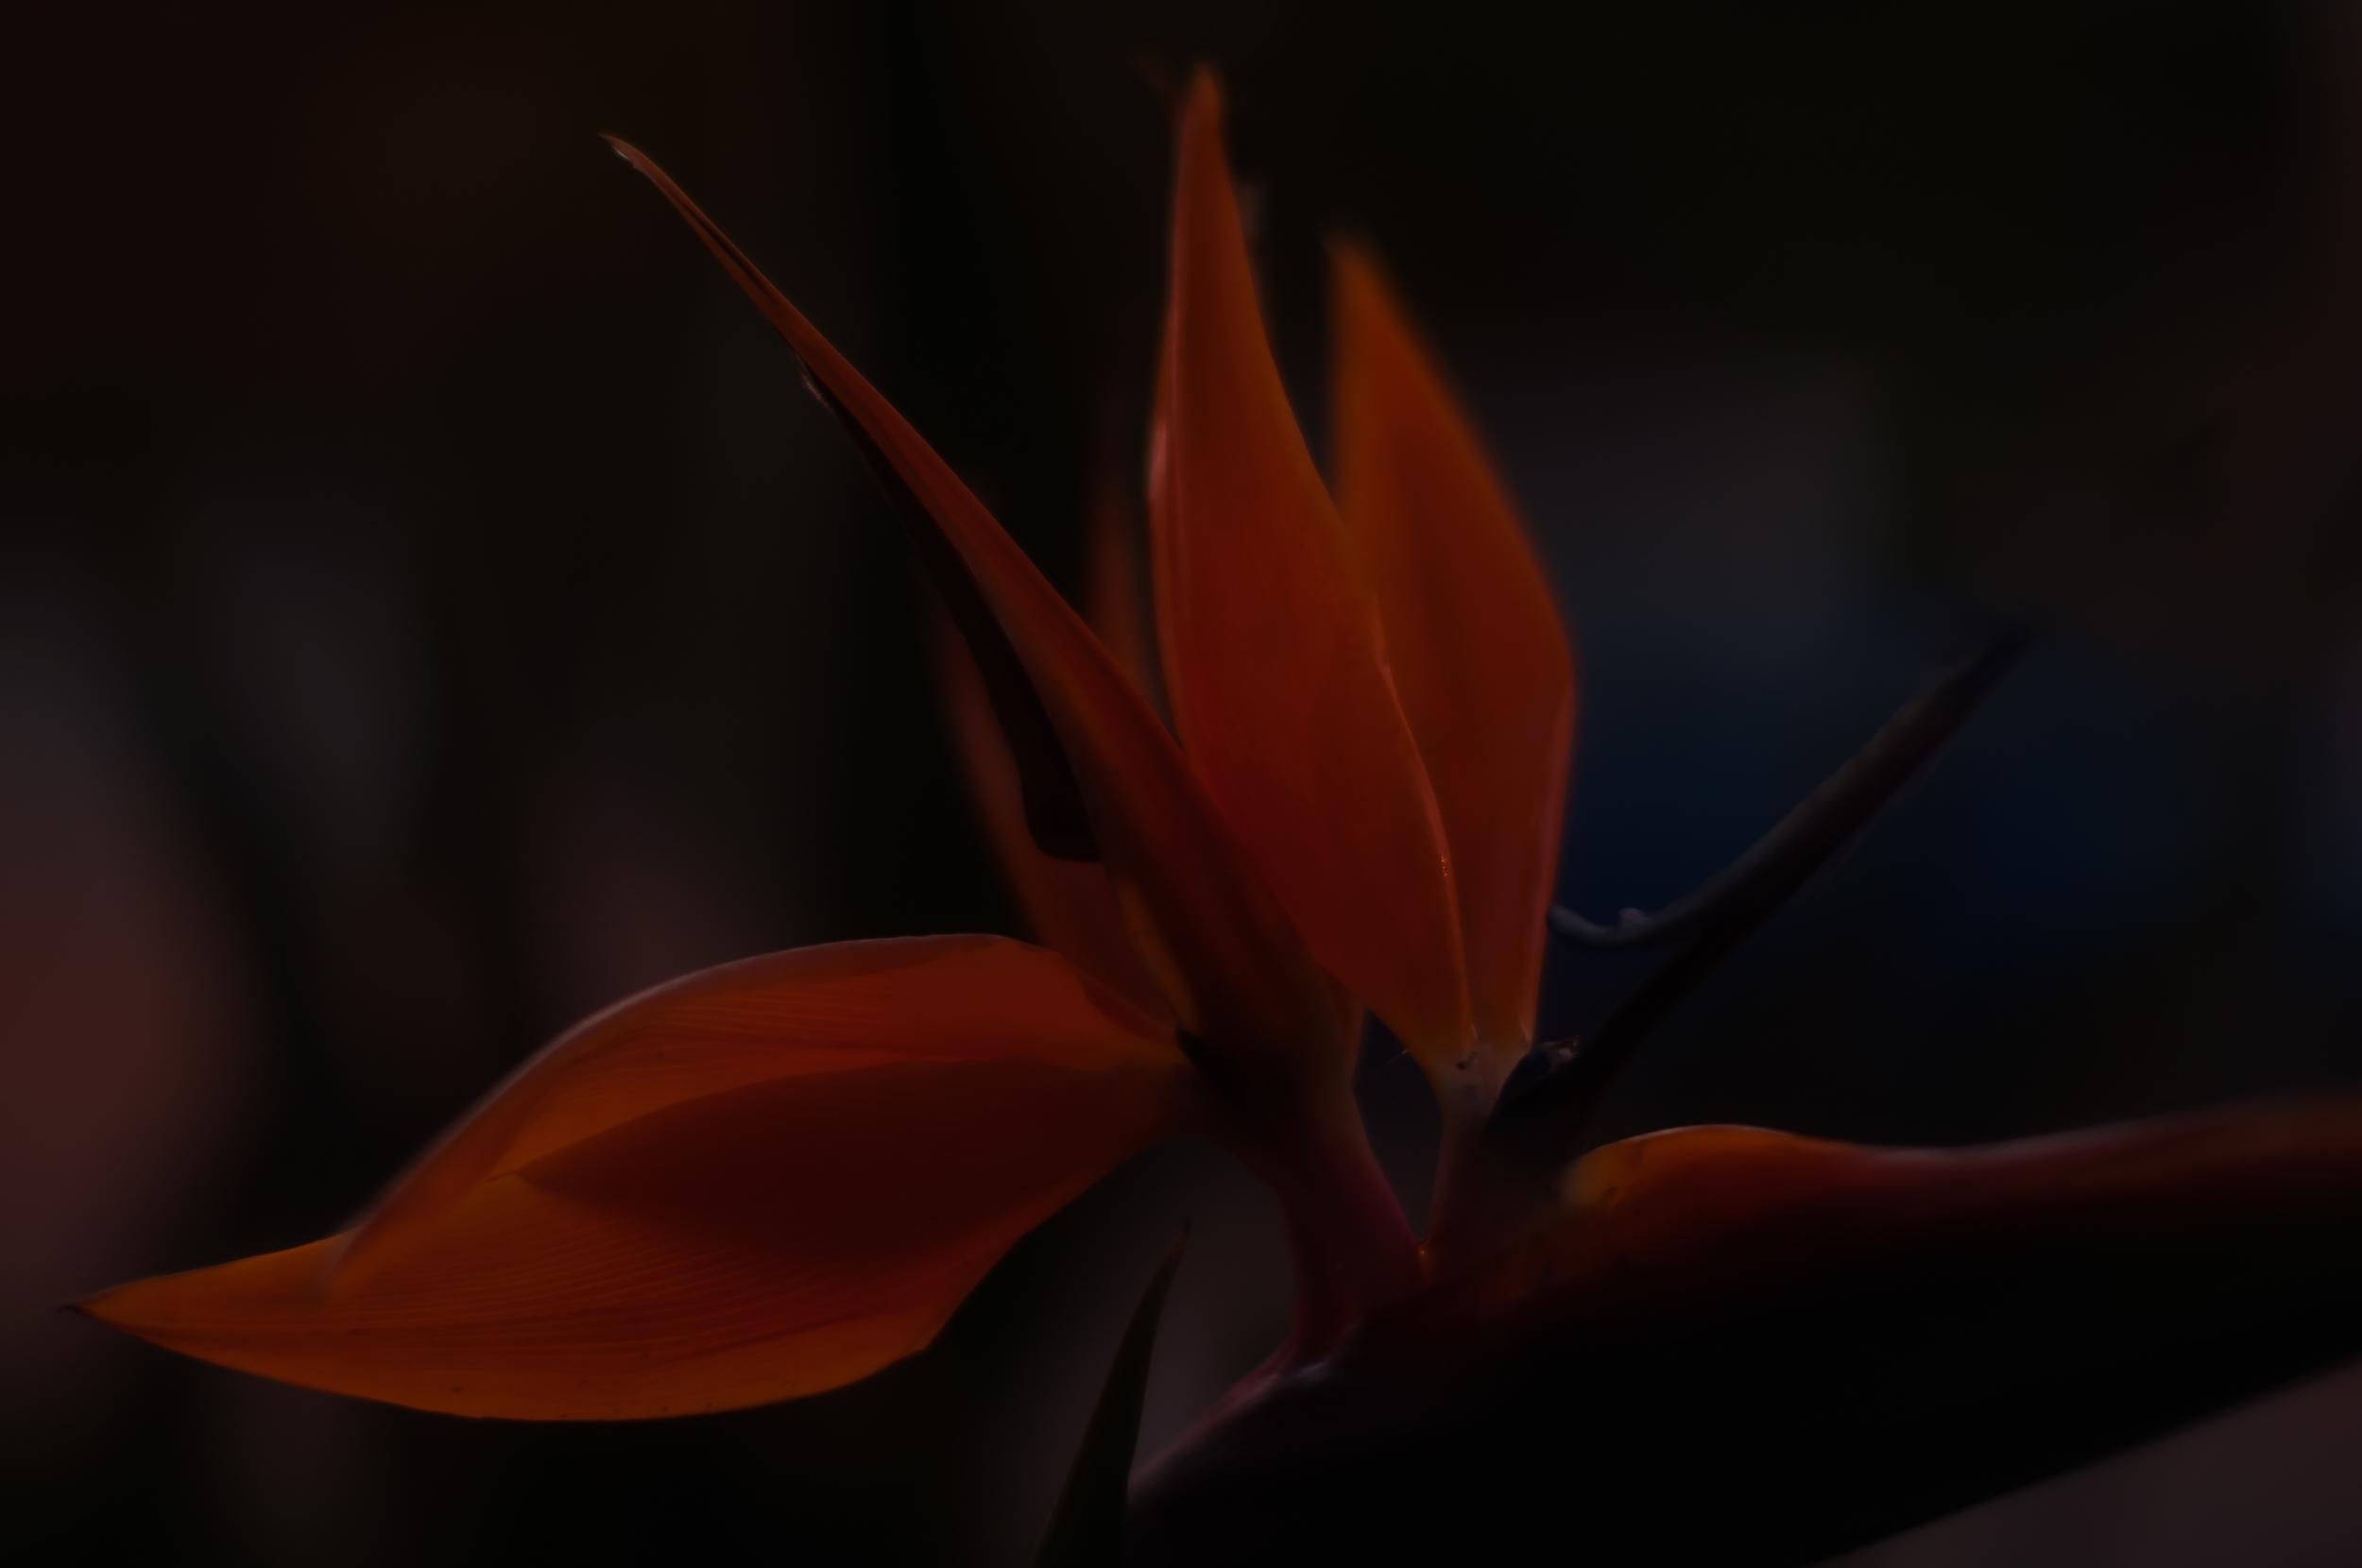 Radiating light - flower hotography